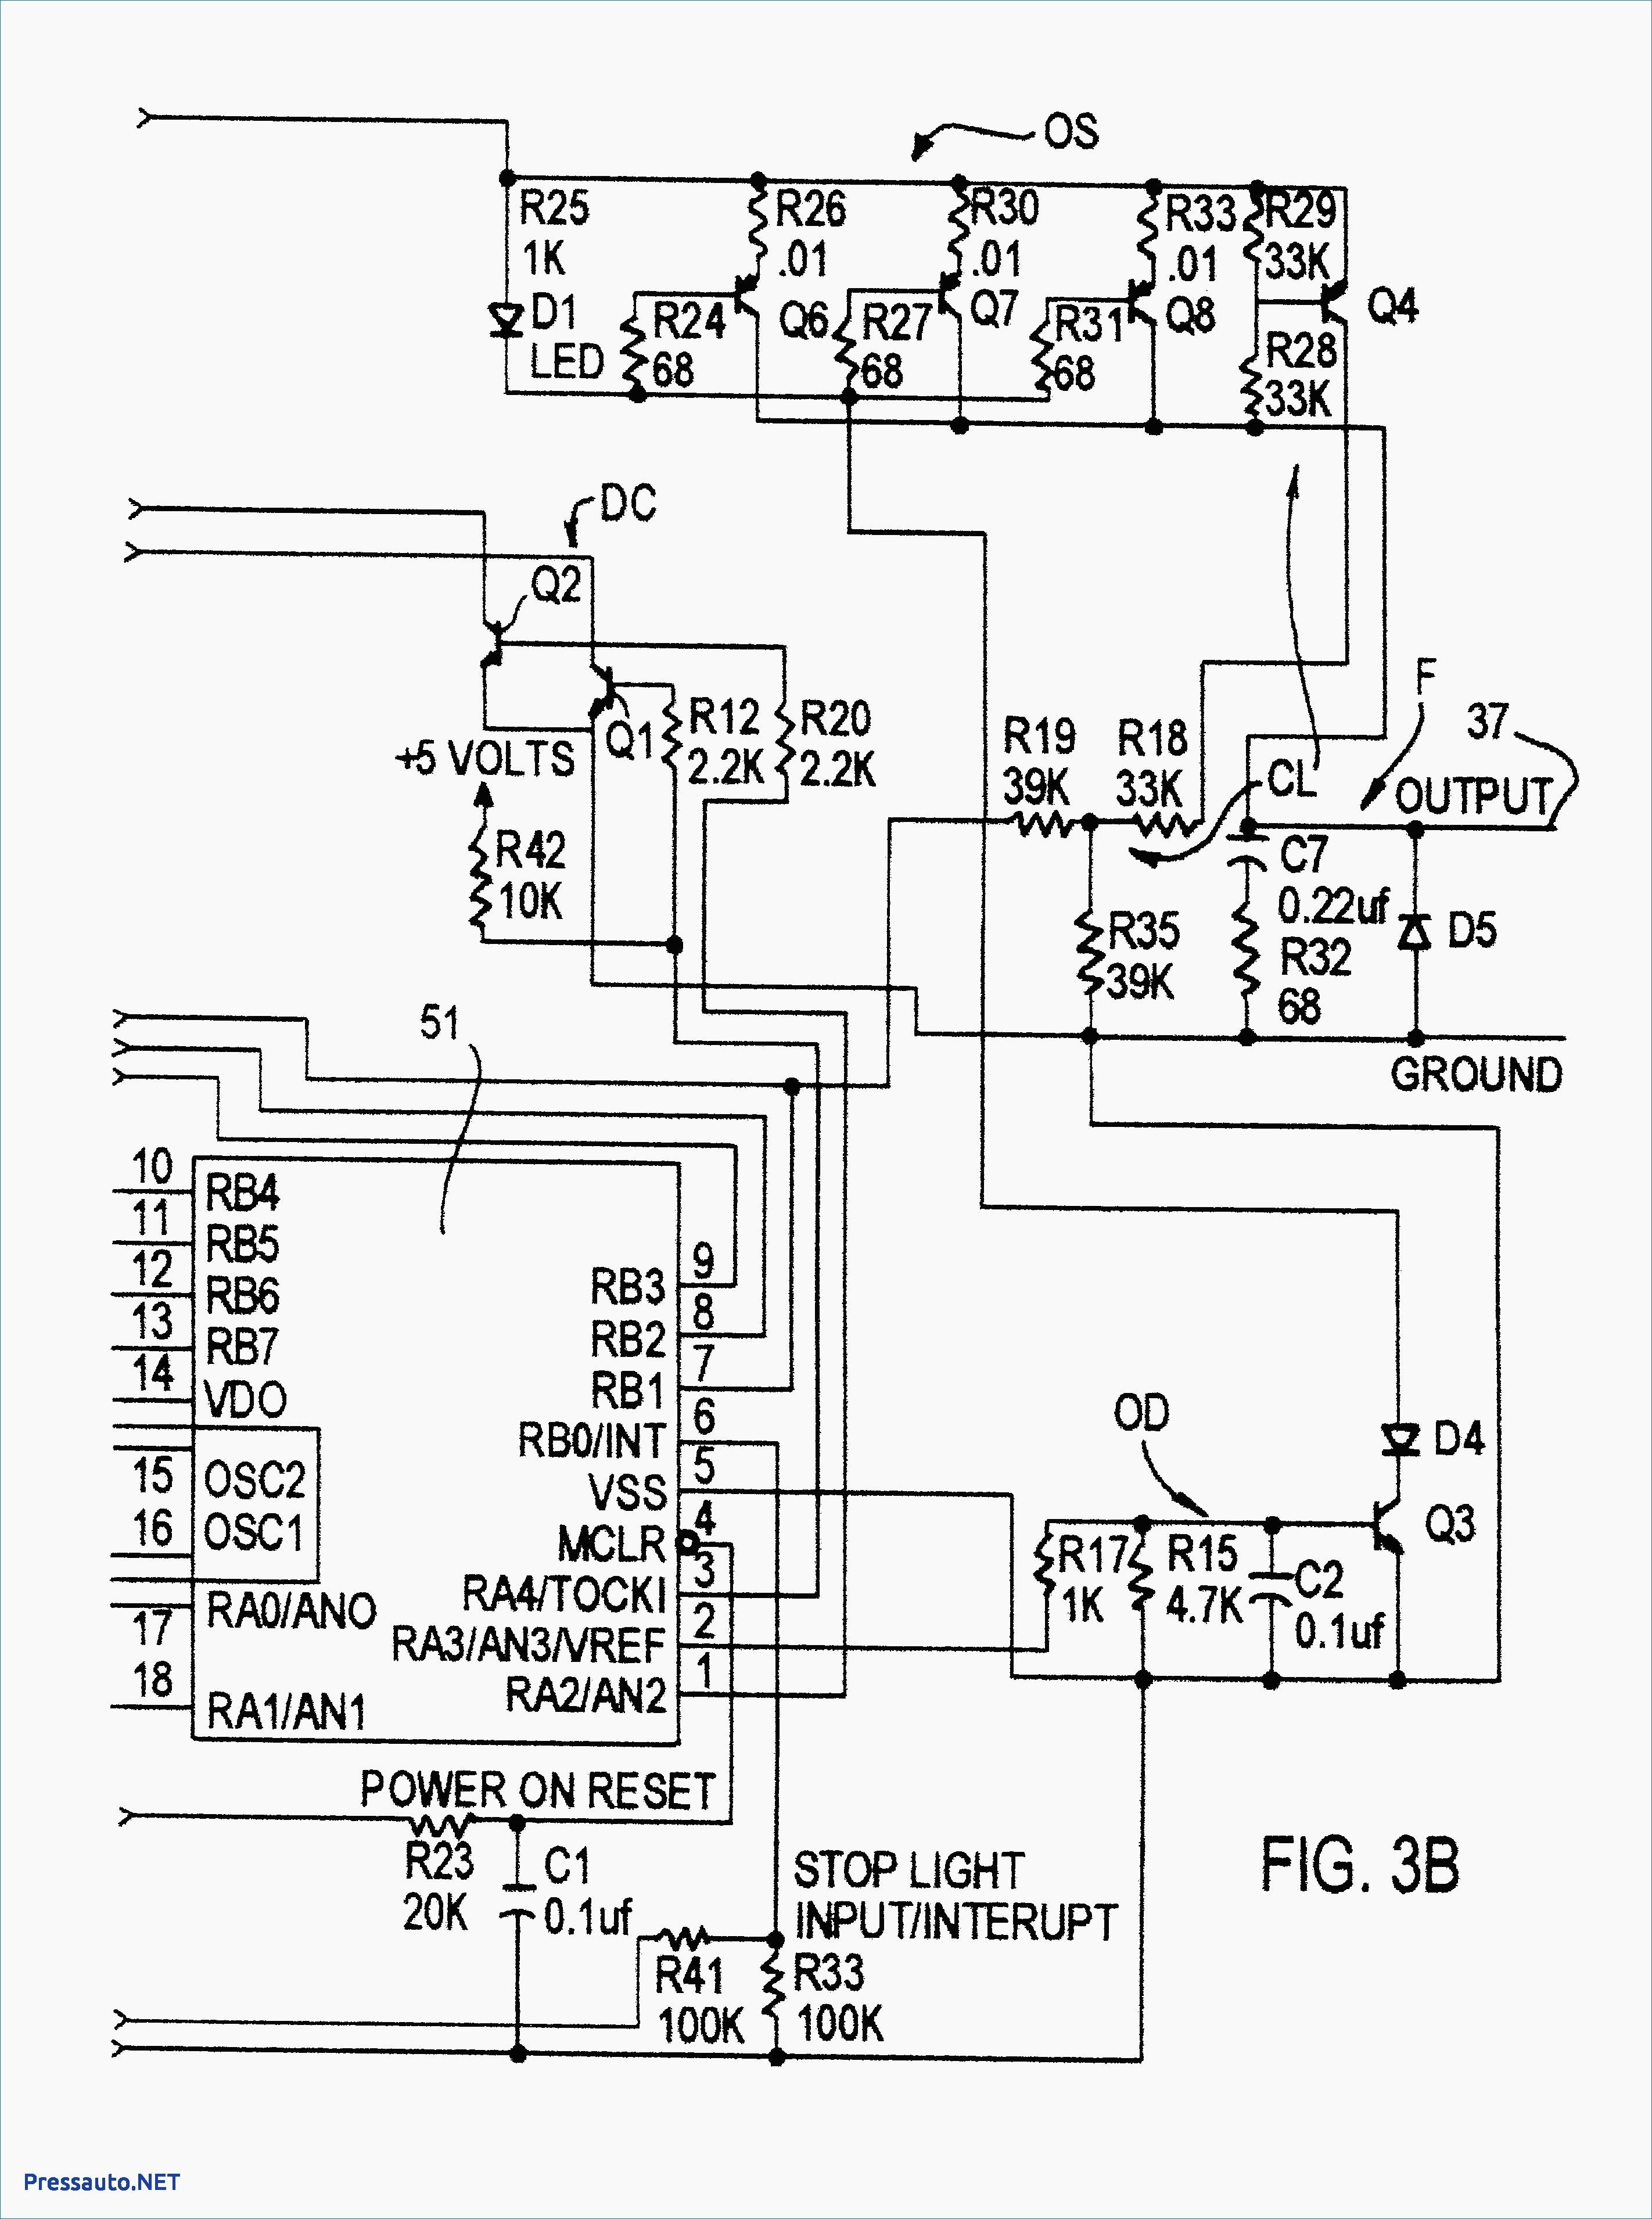 John Deere X320 Wiring Diagram   Wiring Diagram on john deere gx335 wiring diagram, john deere x500 wiring diagram, john deere lx279 wiring diagram, john deere z445 wiring diagram, john deere srx75 wiring diagram, john deere x495 wiring diagram, john deere x304 wiring diagram, john deere lt180 wiring diagram, john deere x475 wiring diagram, john deere x534 wiring diagram, john deere x360 wiring diagram, john deere x595 wiring diagram, john deere la115 wiring diagram, john deere x720 wiring diagram, john deere lx280 wiring diagram, john deere z830a wiring diagram, john deere x740 wiring diagram, john deere gx345 wiring diagram, john deere z425 wiring diagram, john deere lx173 wiring diagram,